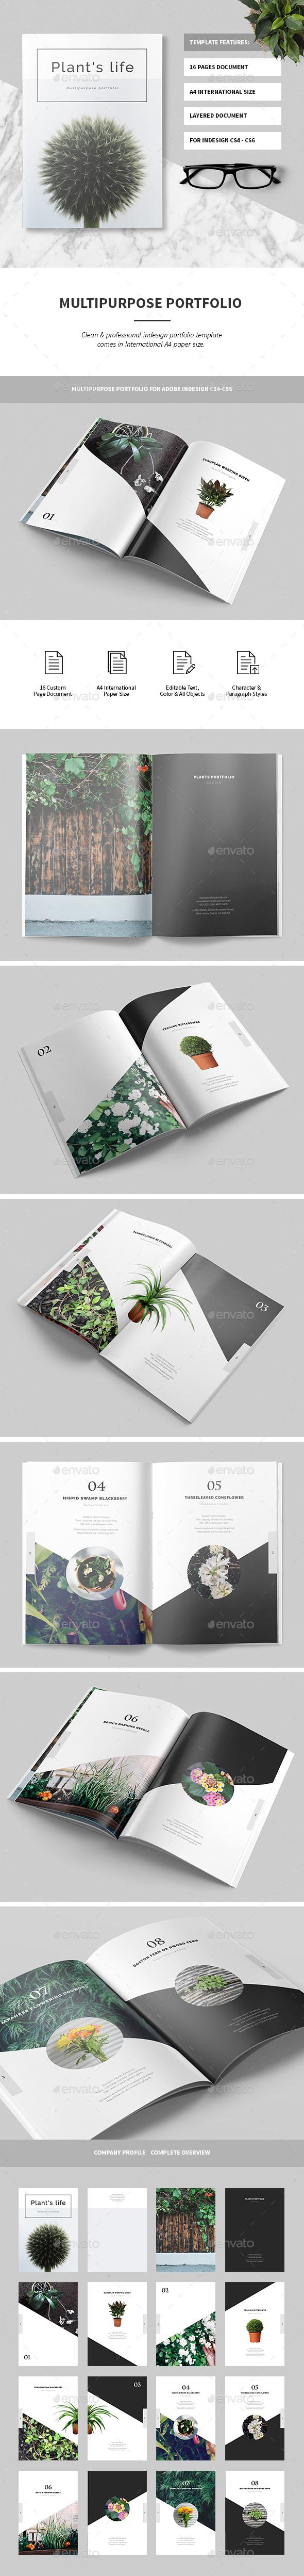 Portfolio Brochure Template InDesign INDD. Download here: https ...